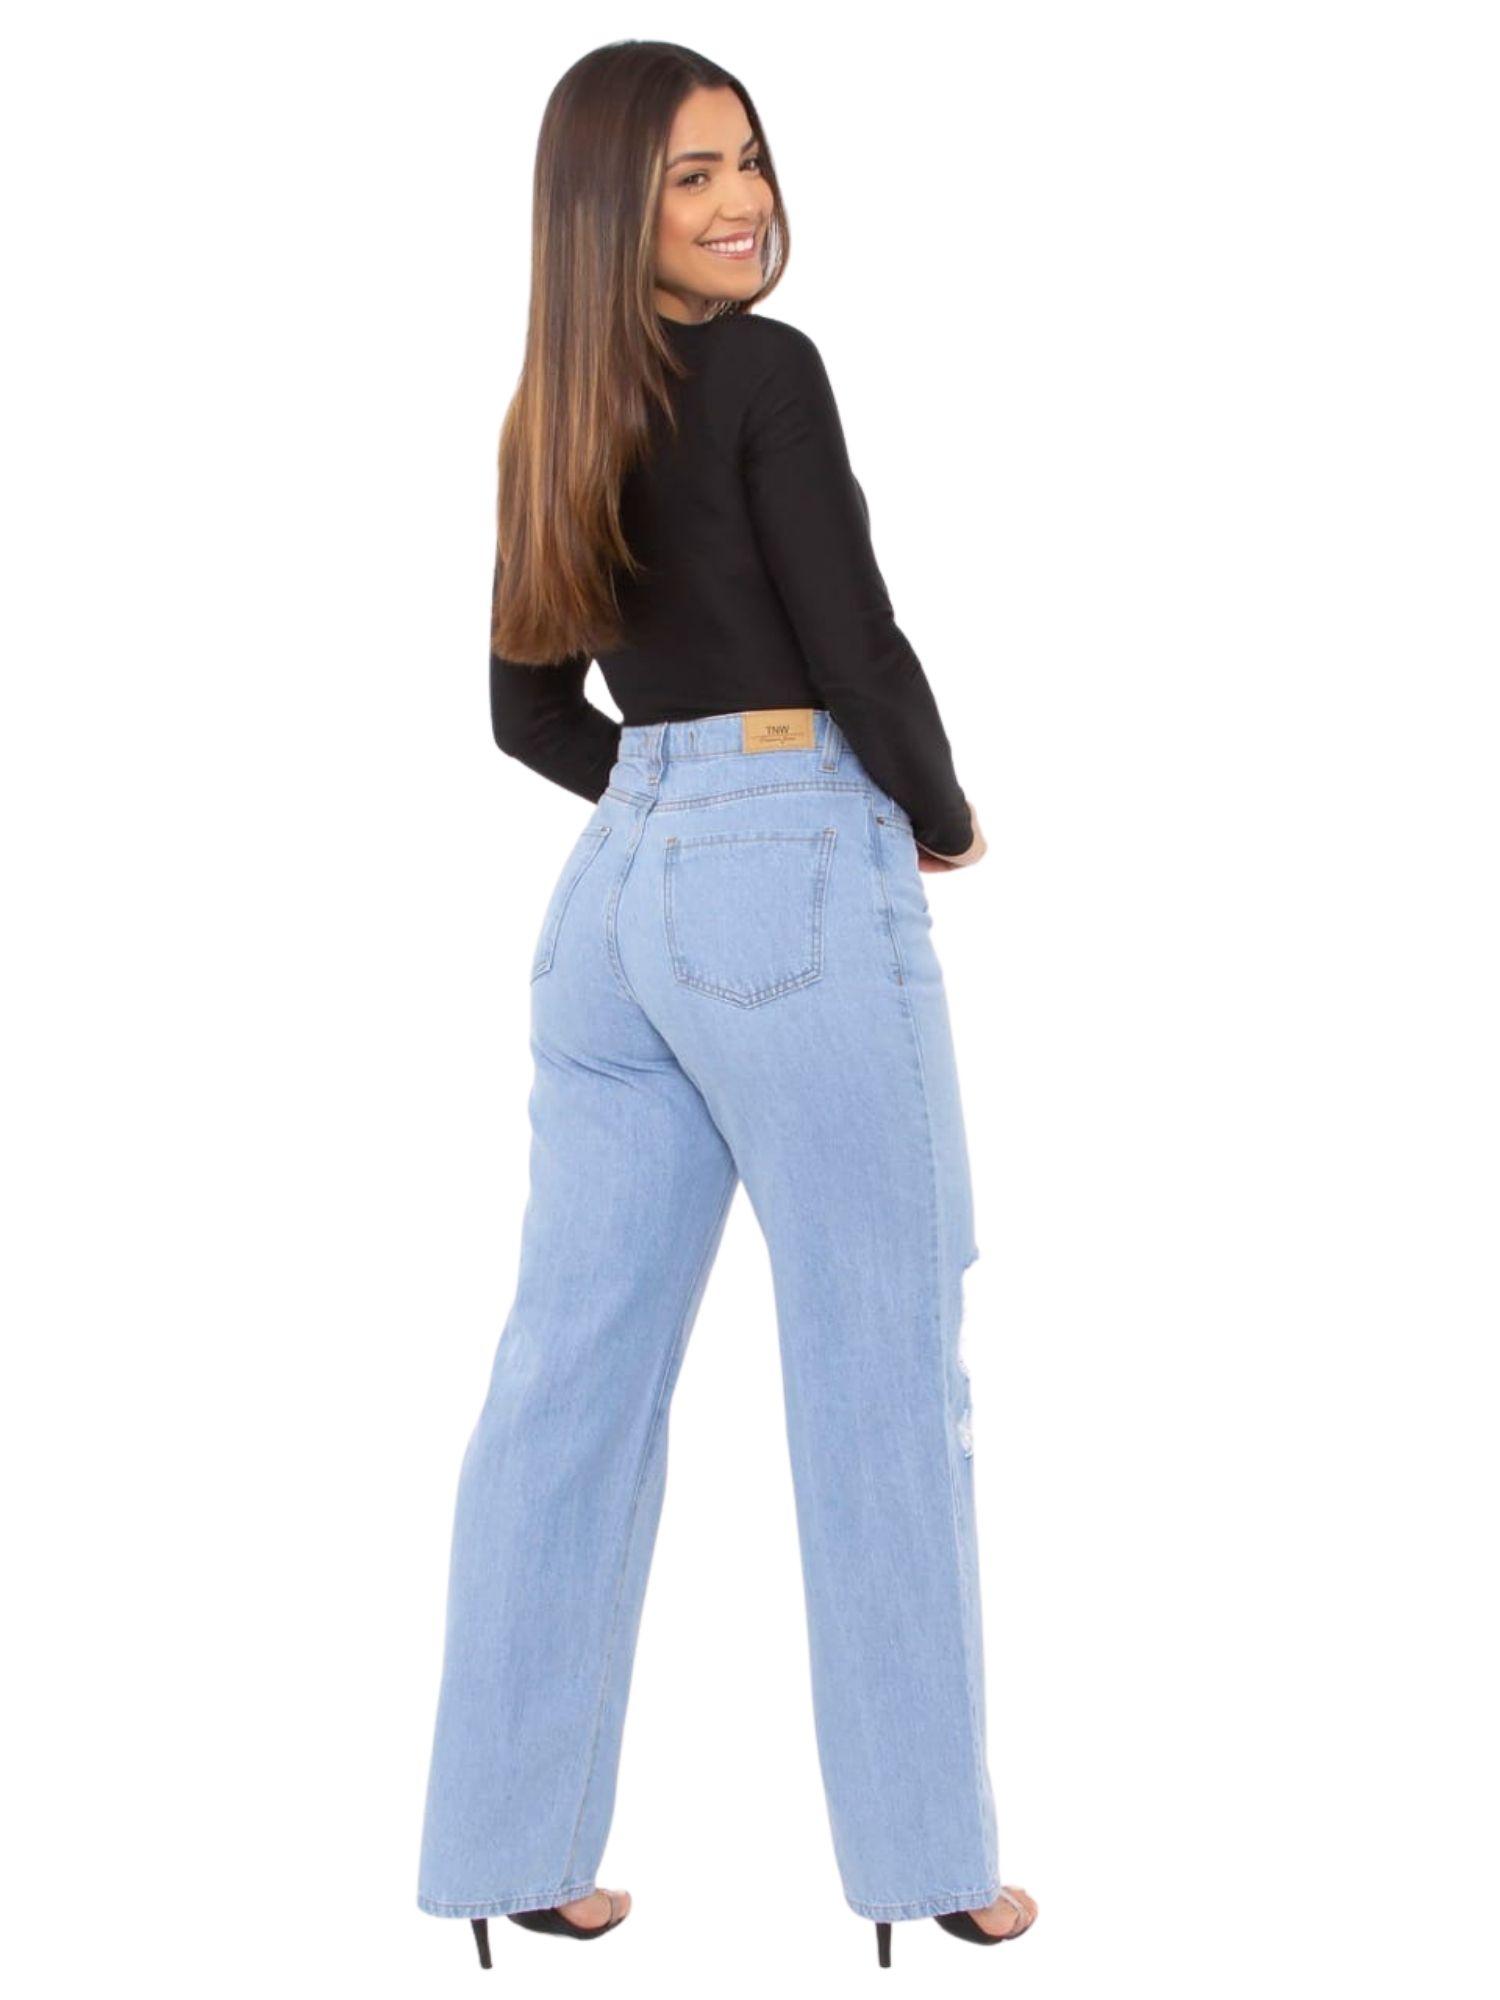 Calça Feminina Wide Leg Rasgada Tnw Jeans 44046